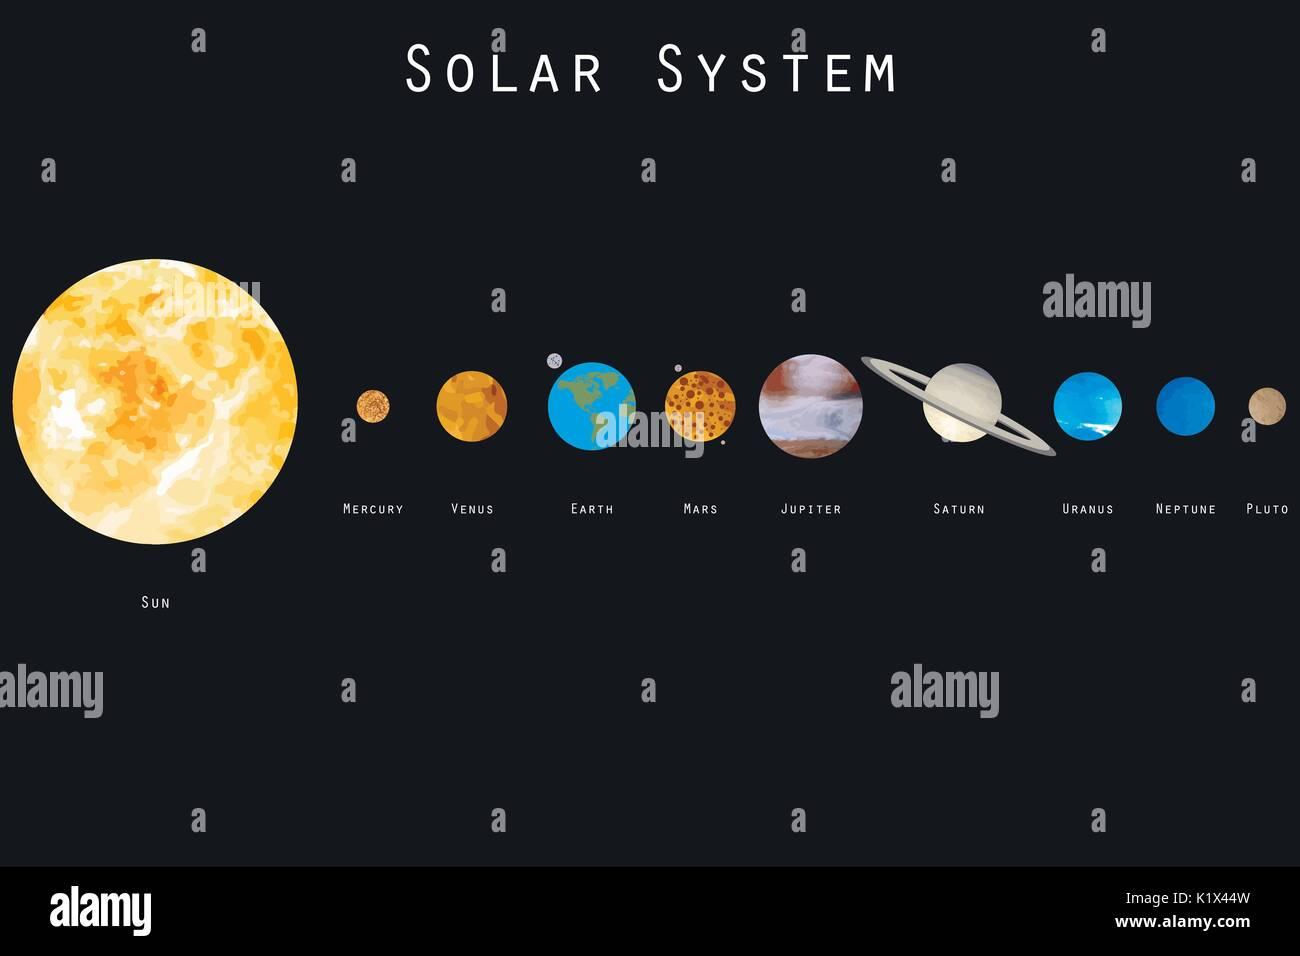 solar system vector - photo #29